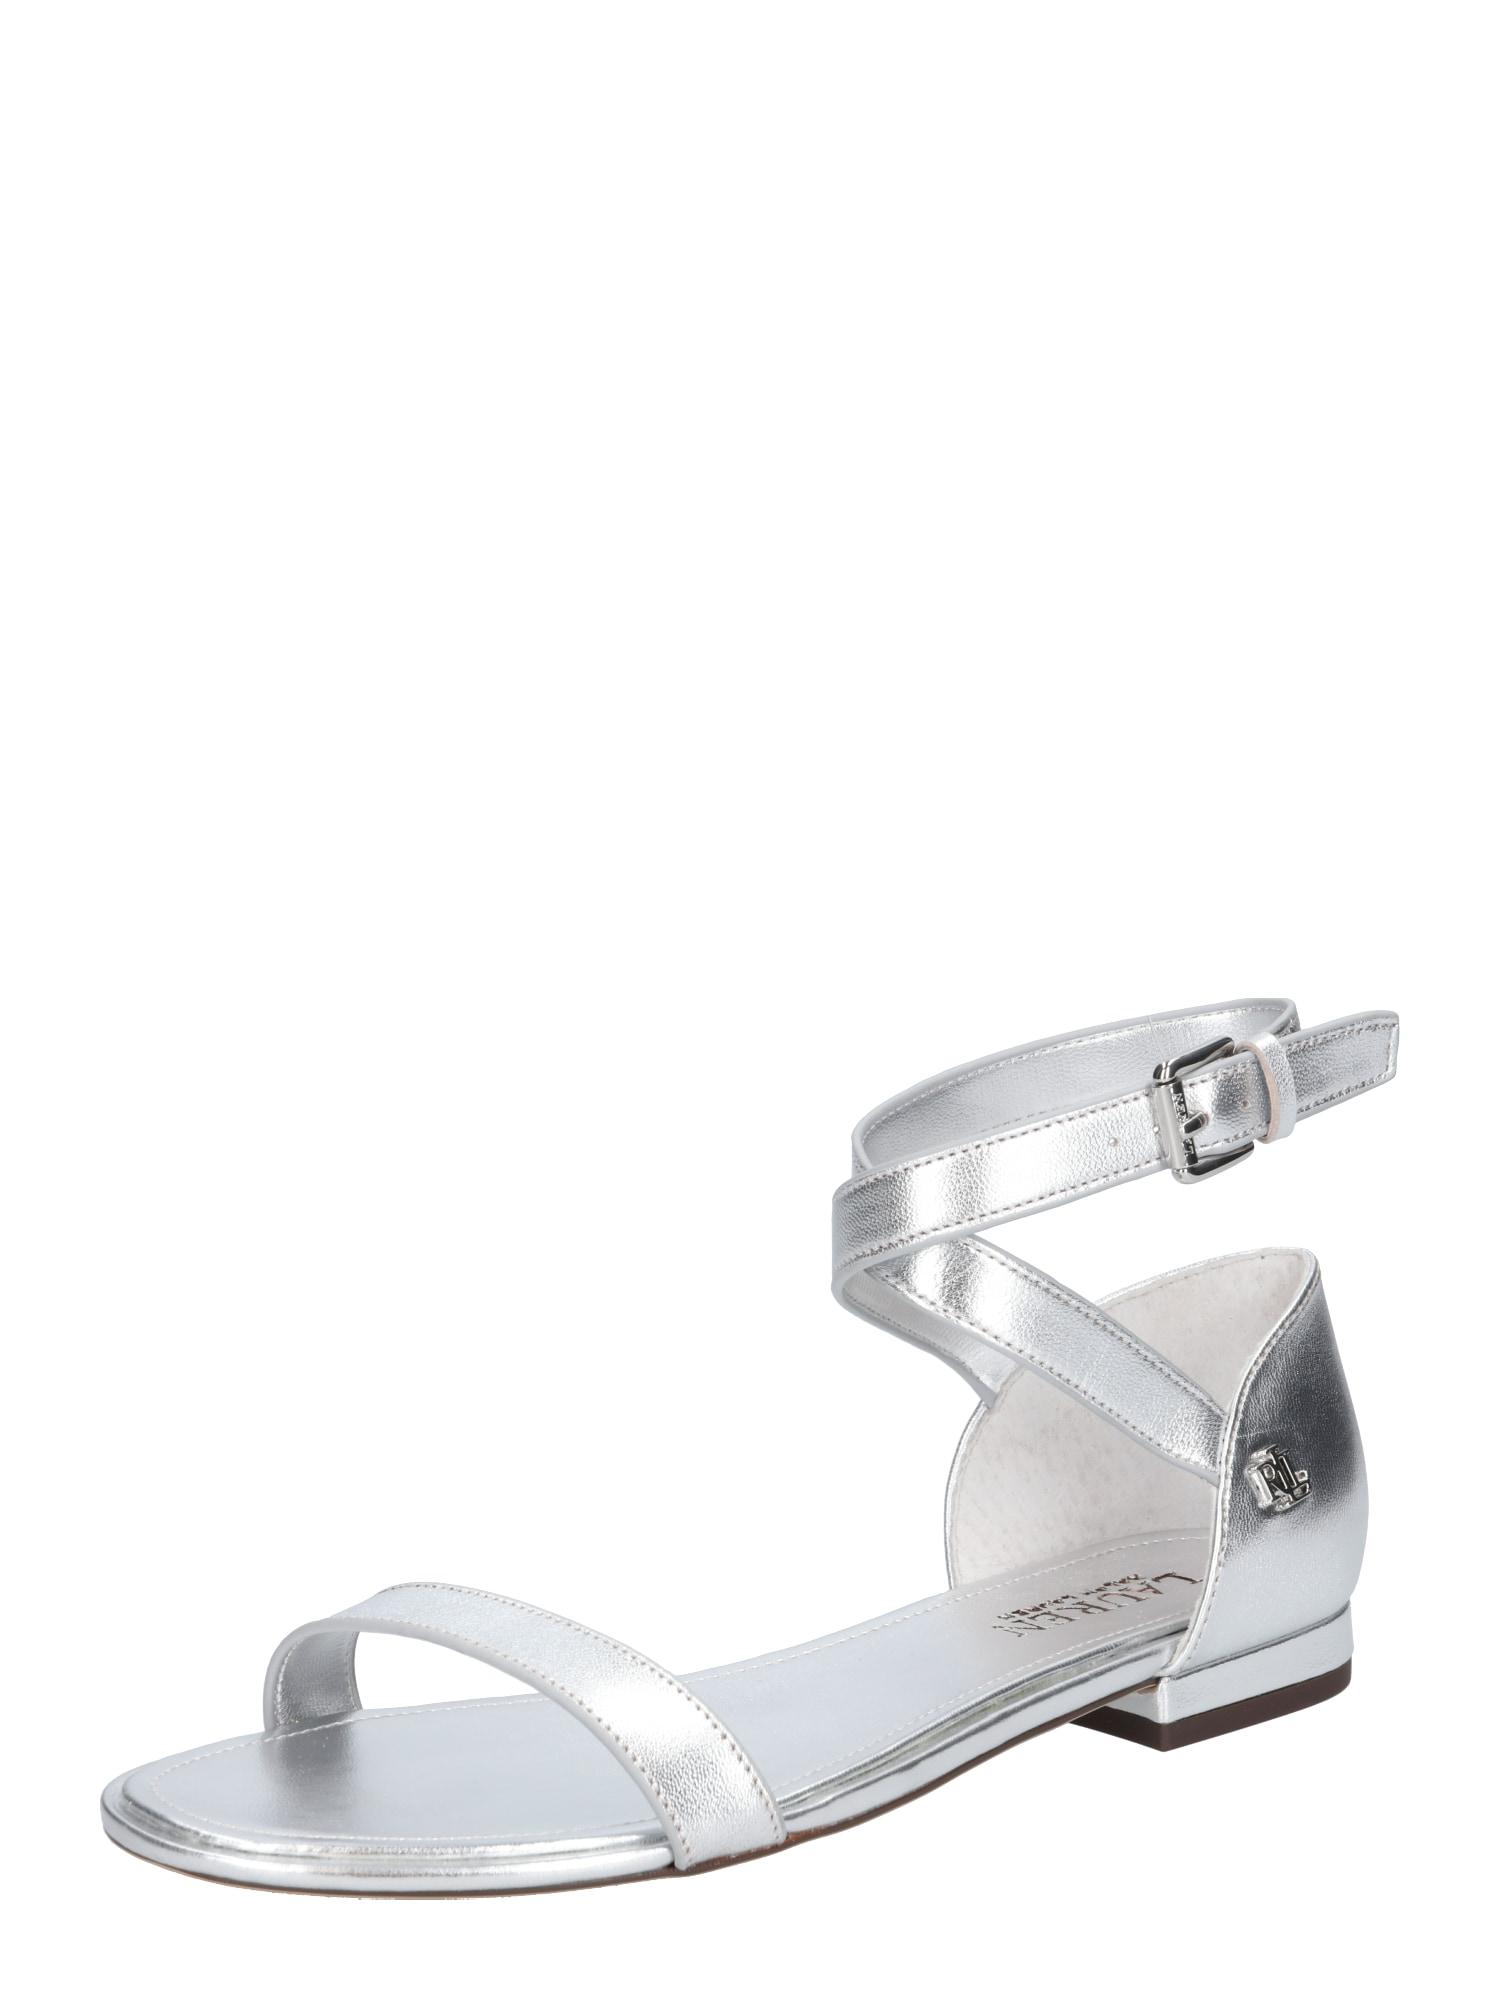 Sandály Davison stříbrná Lauren Ralph Lauren